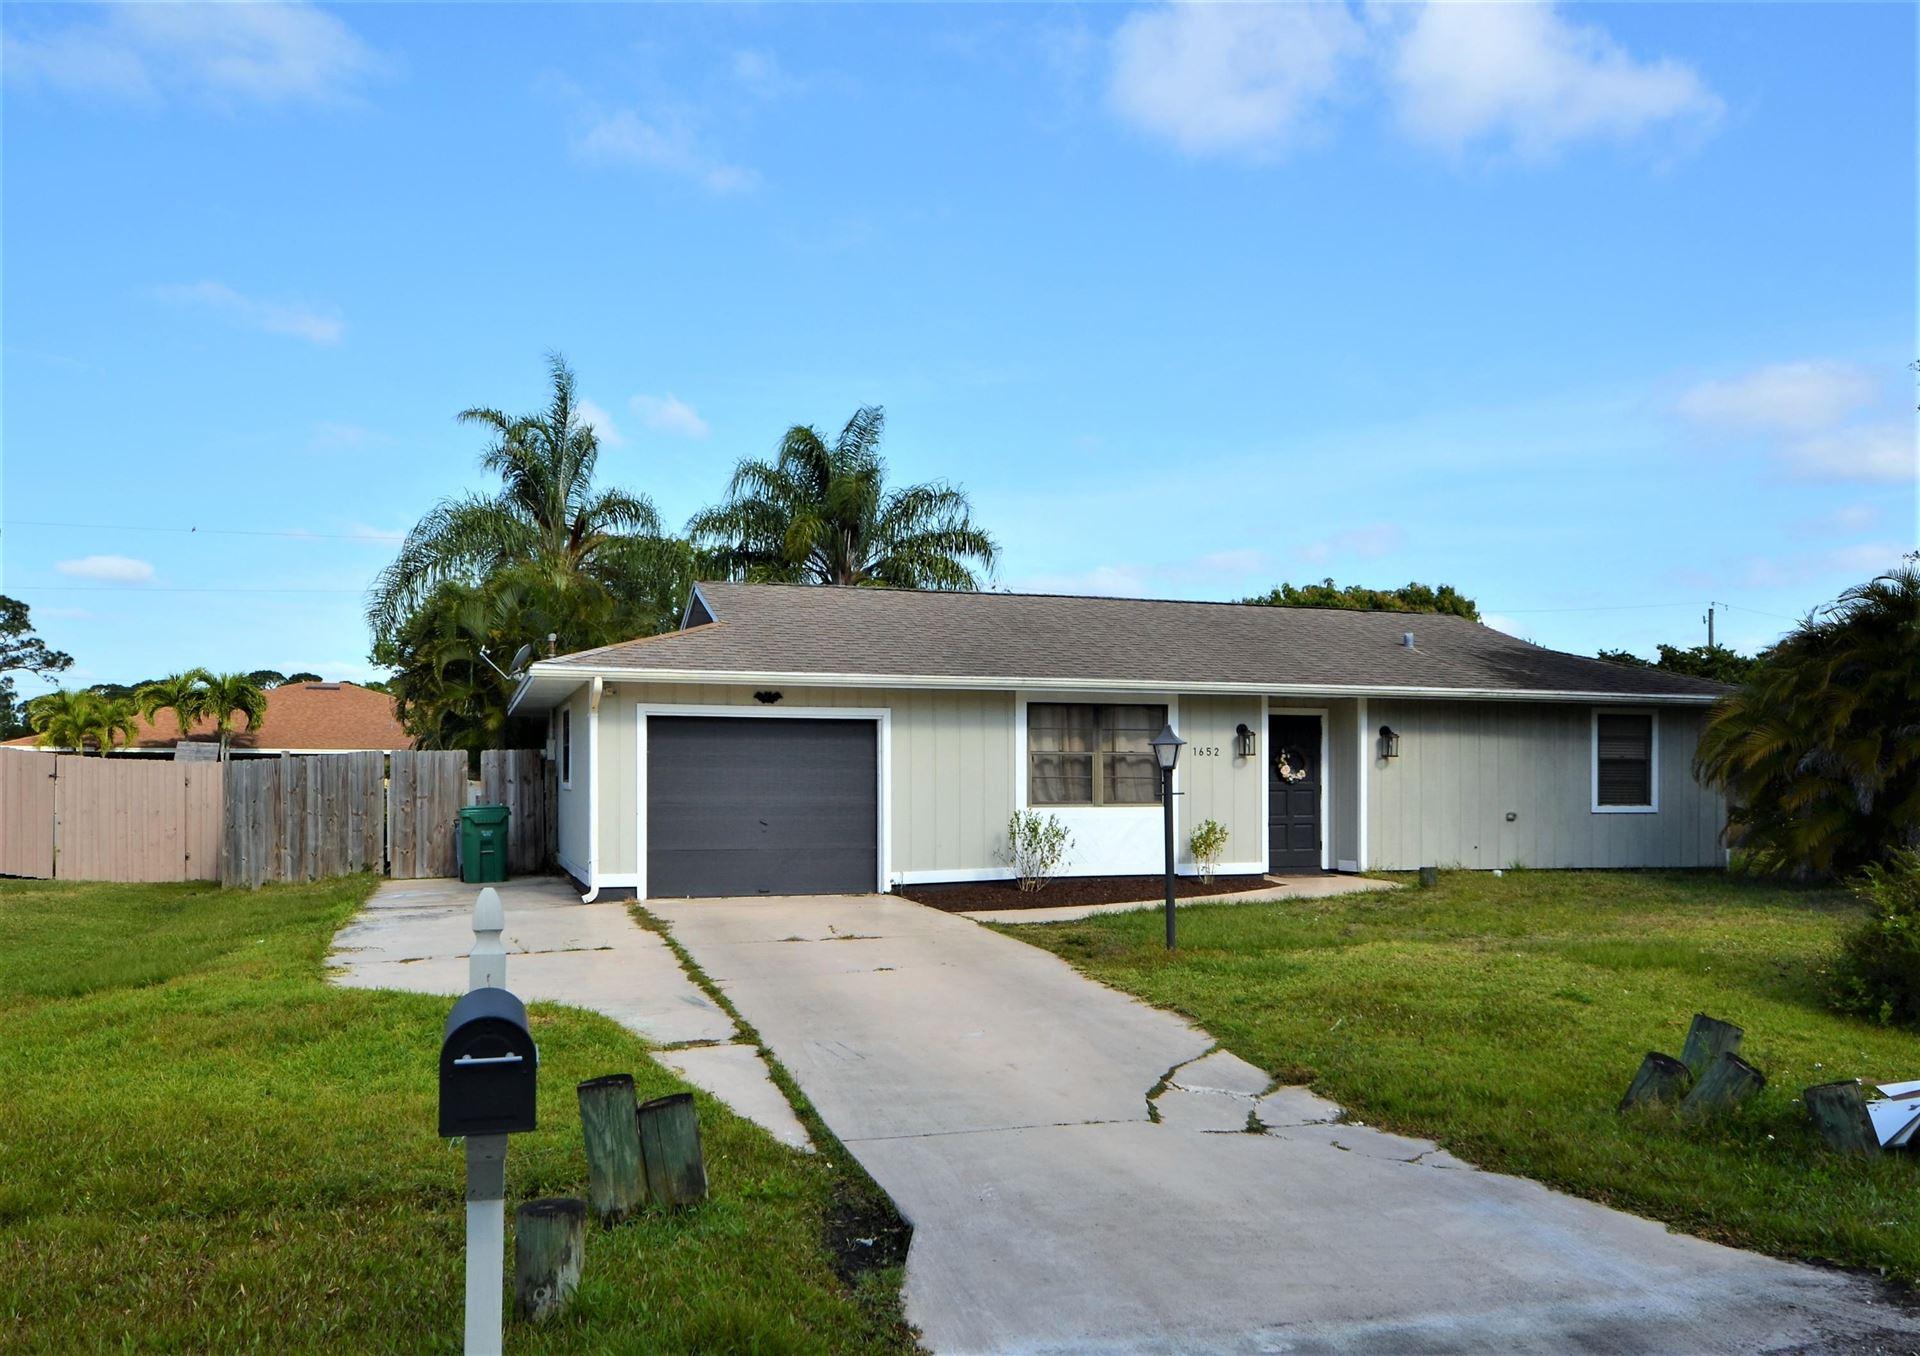 1652 SE Pleasantview Street, Port Saint Lucie, FL 34983 - MLS#: RX-10708419